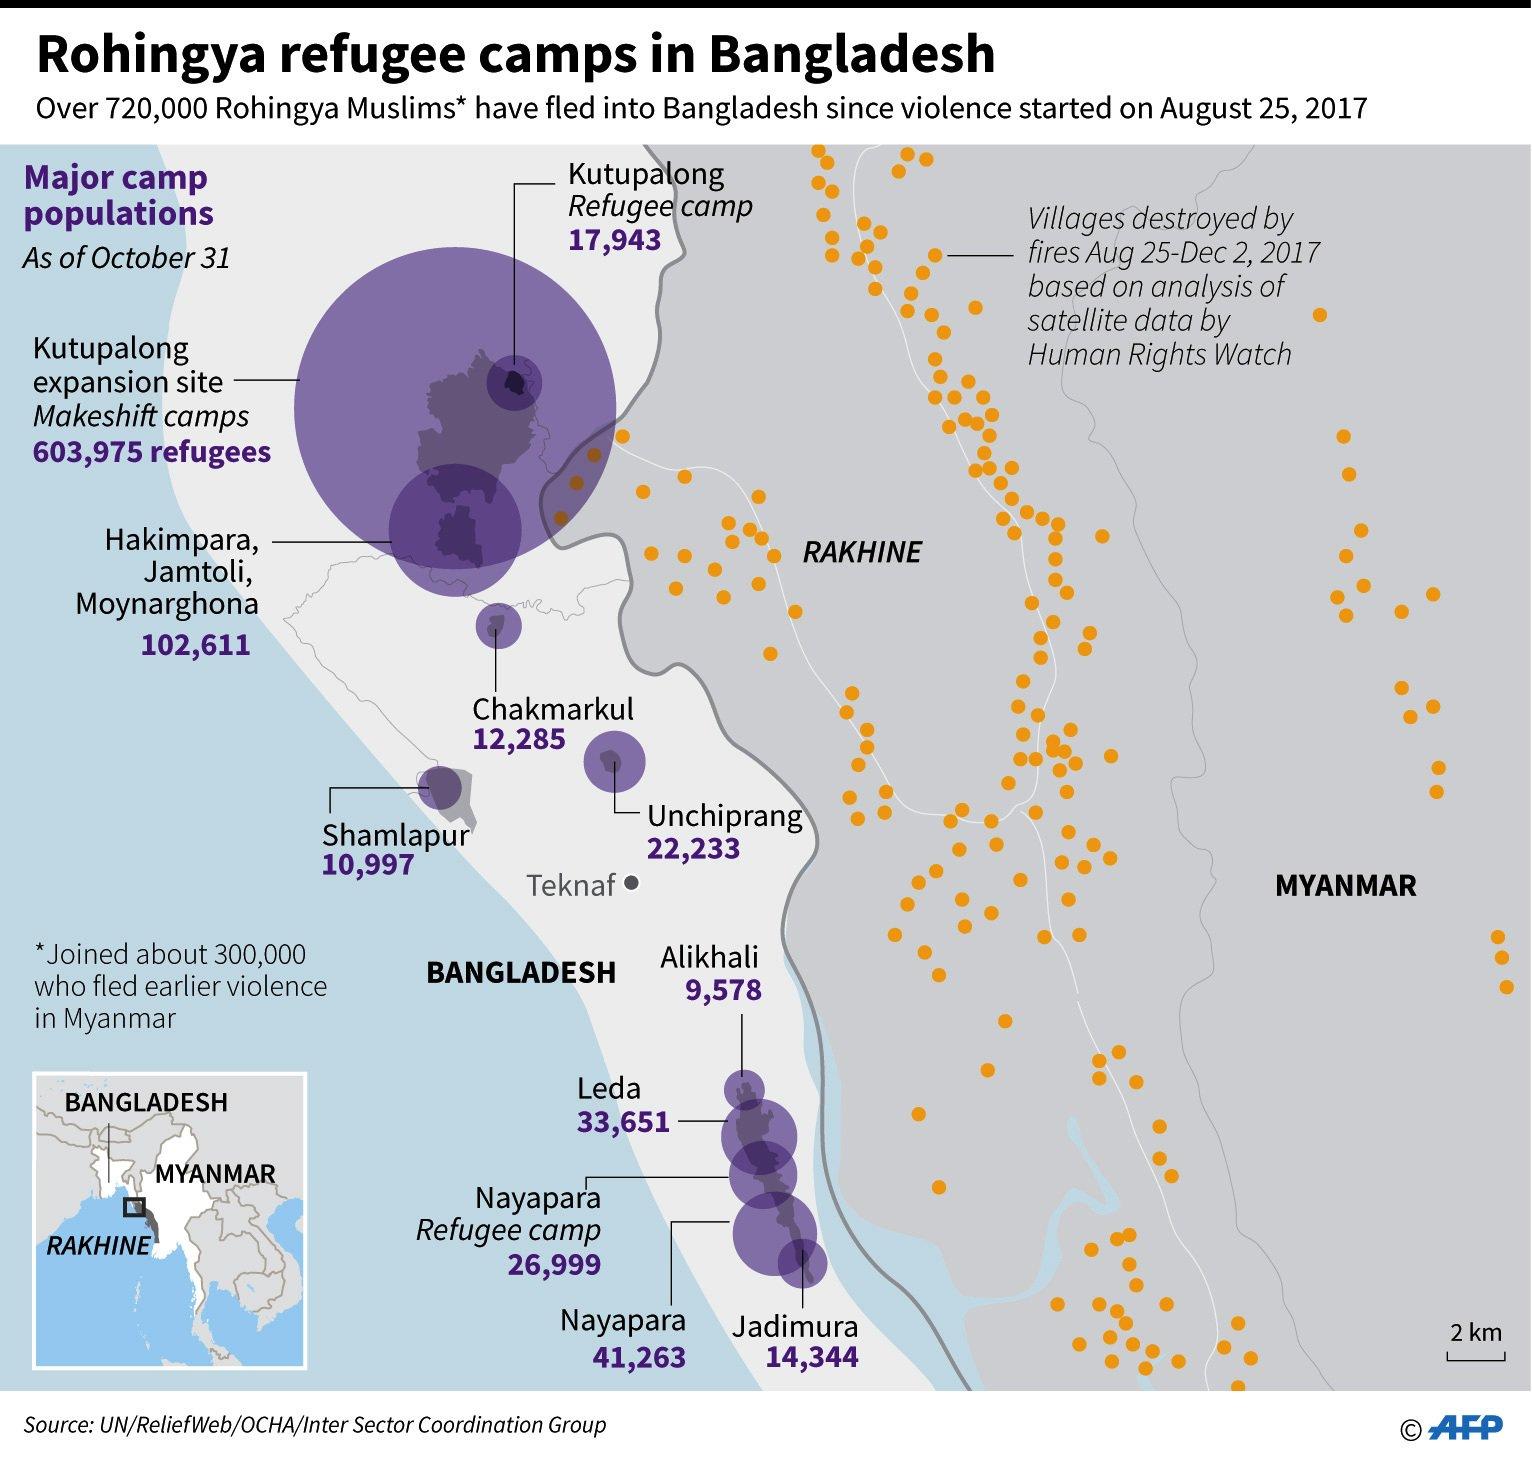 Map showing major Rohingya refugee camp populations in Bangladesh